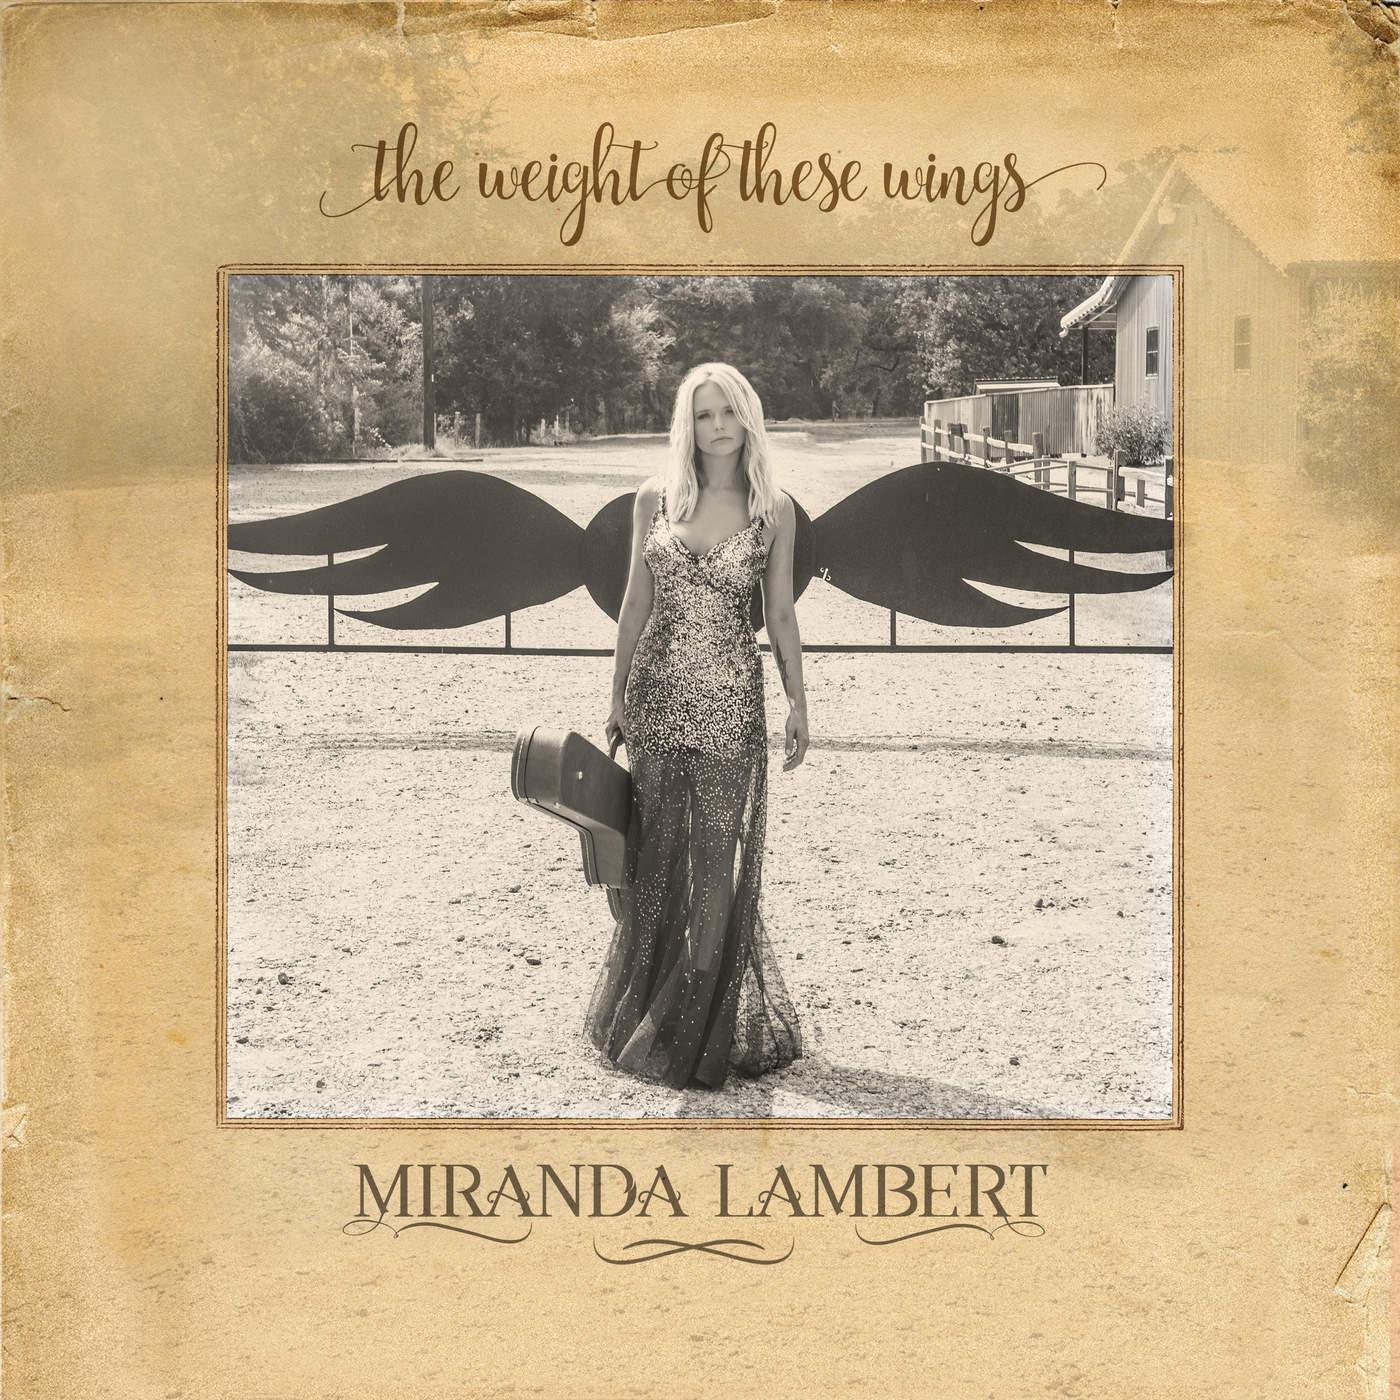 Miranda Lambert - The Weight of These Wings Cover